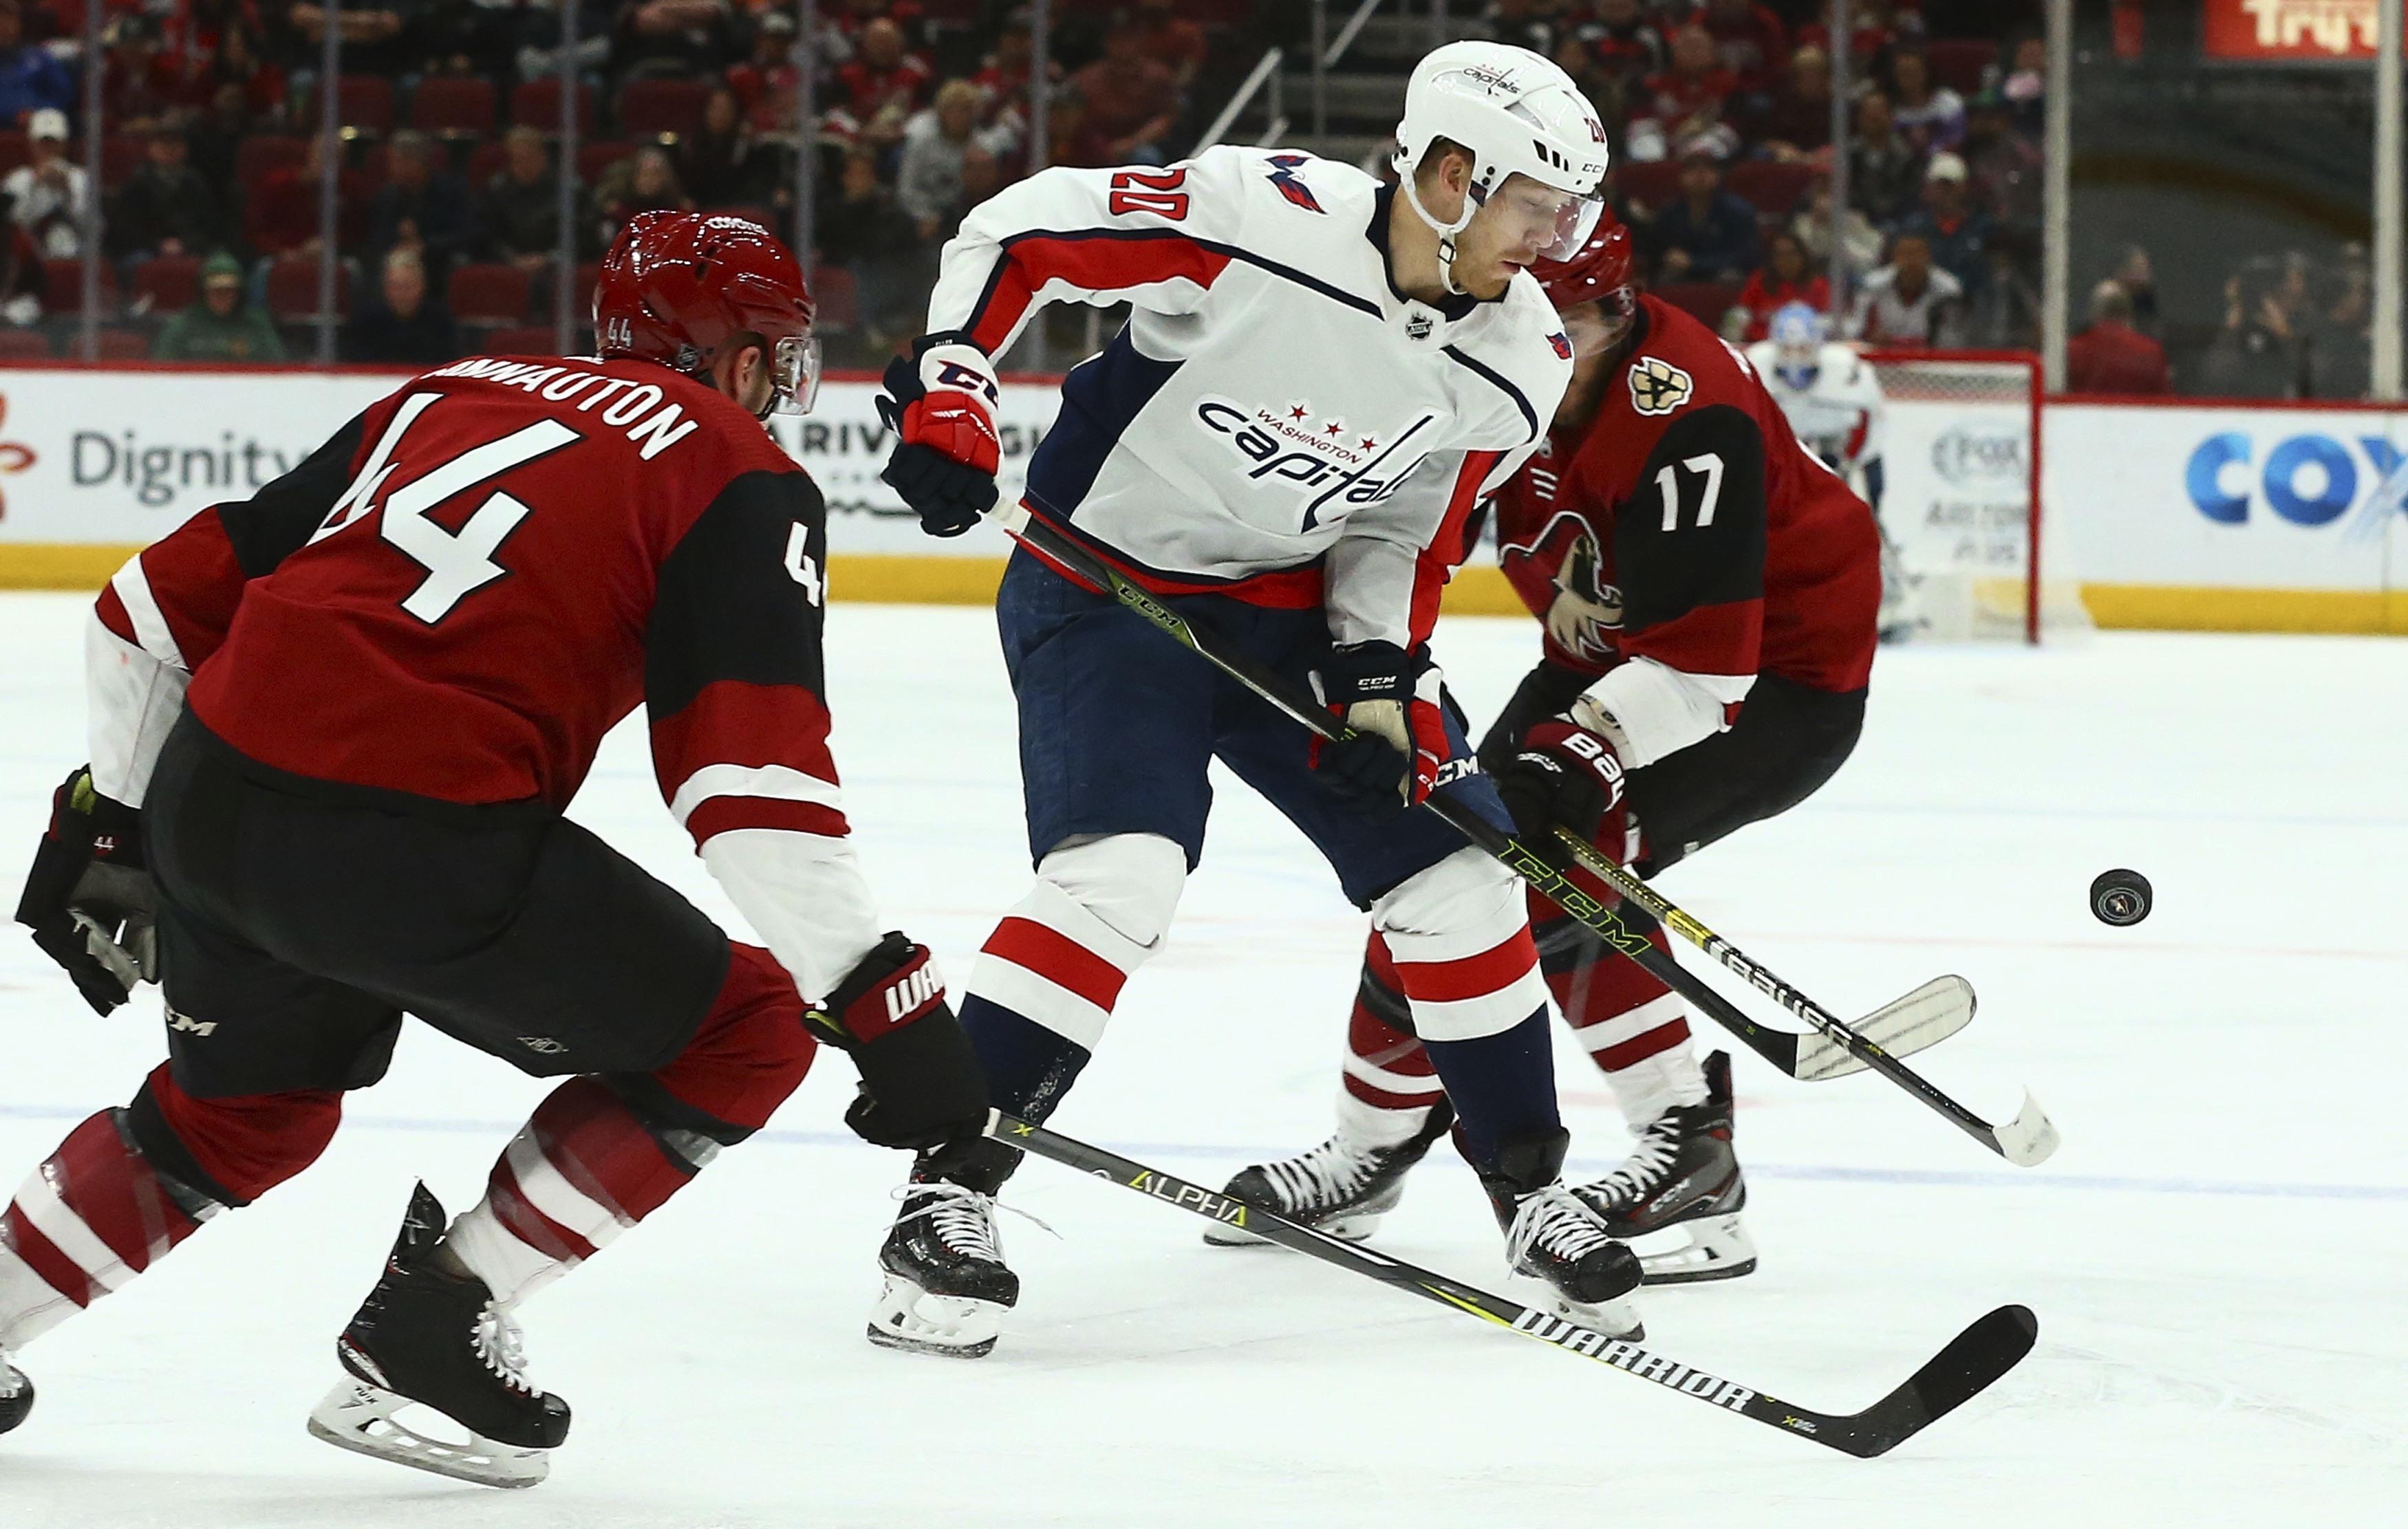 Burakovsky's goal sends Capitals to 4-2 win over Coyotes